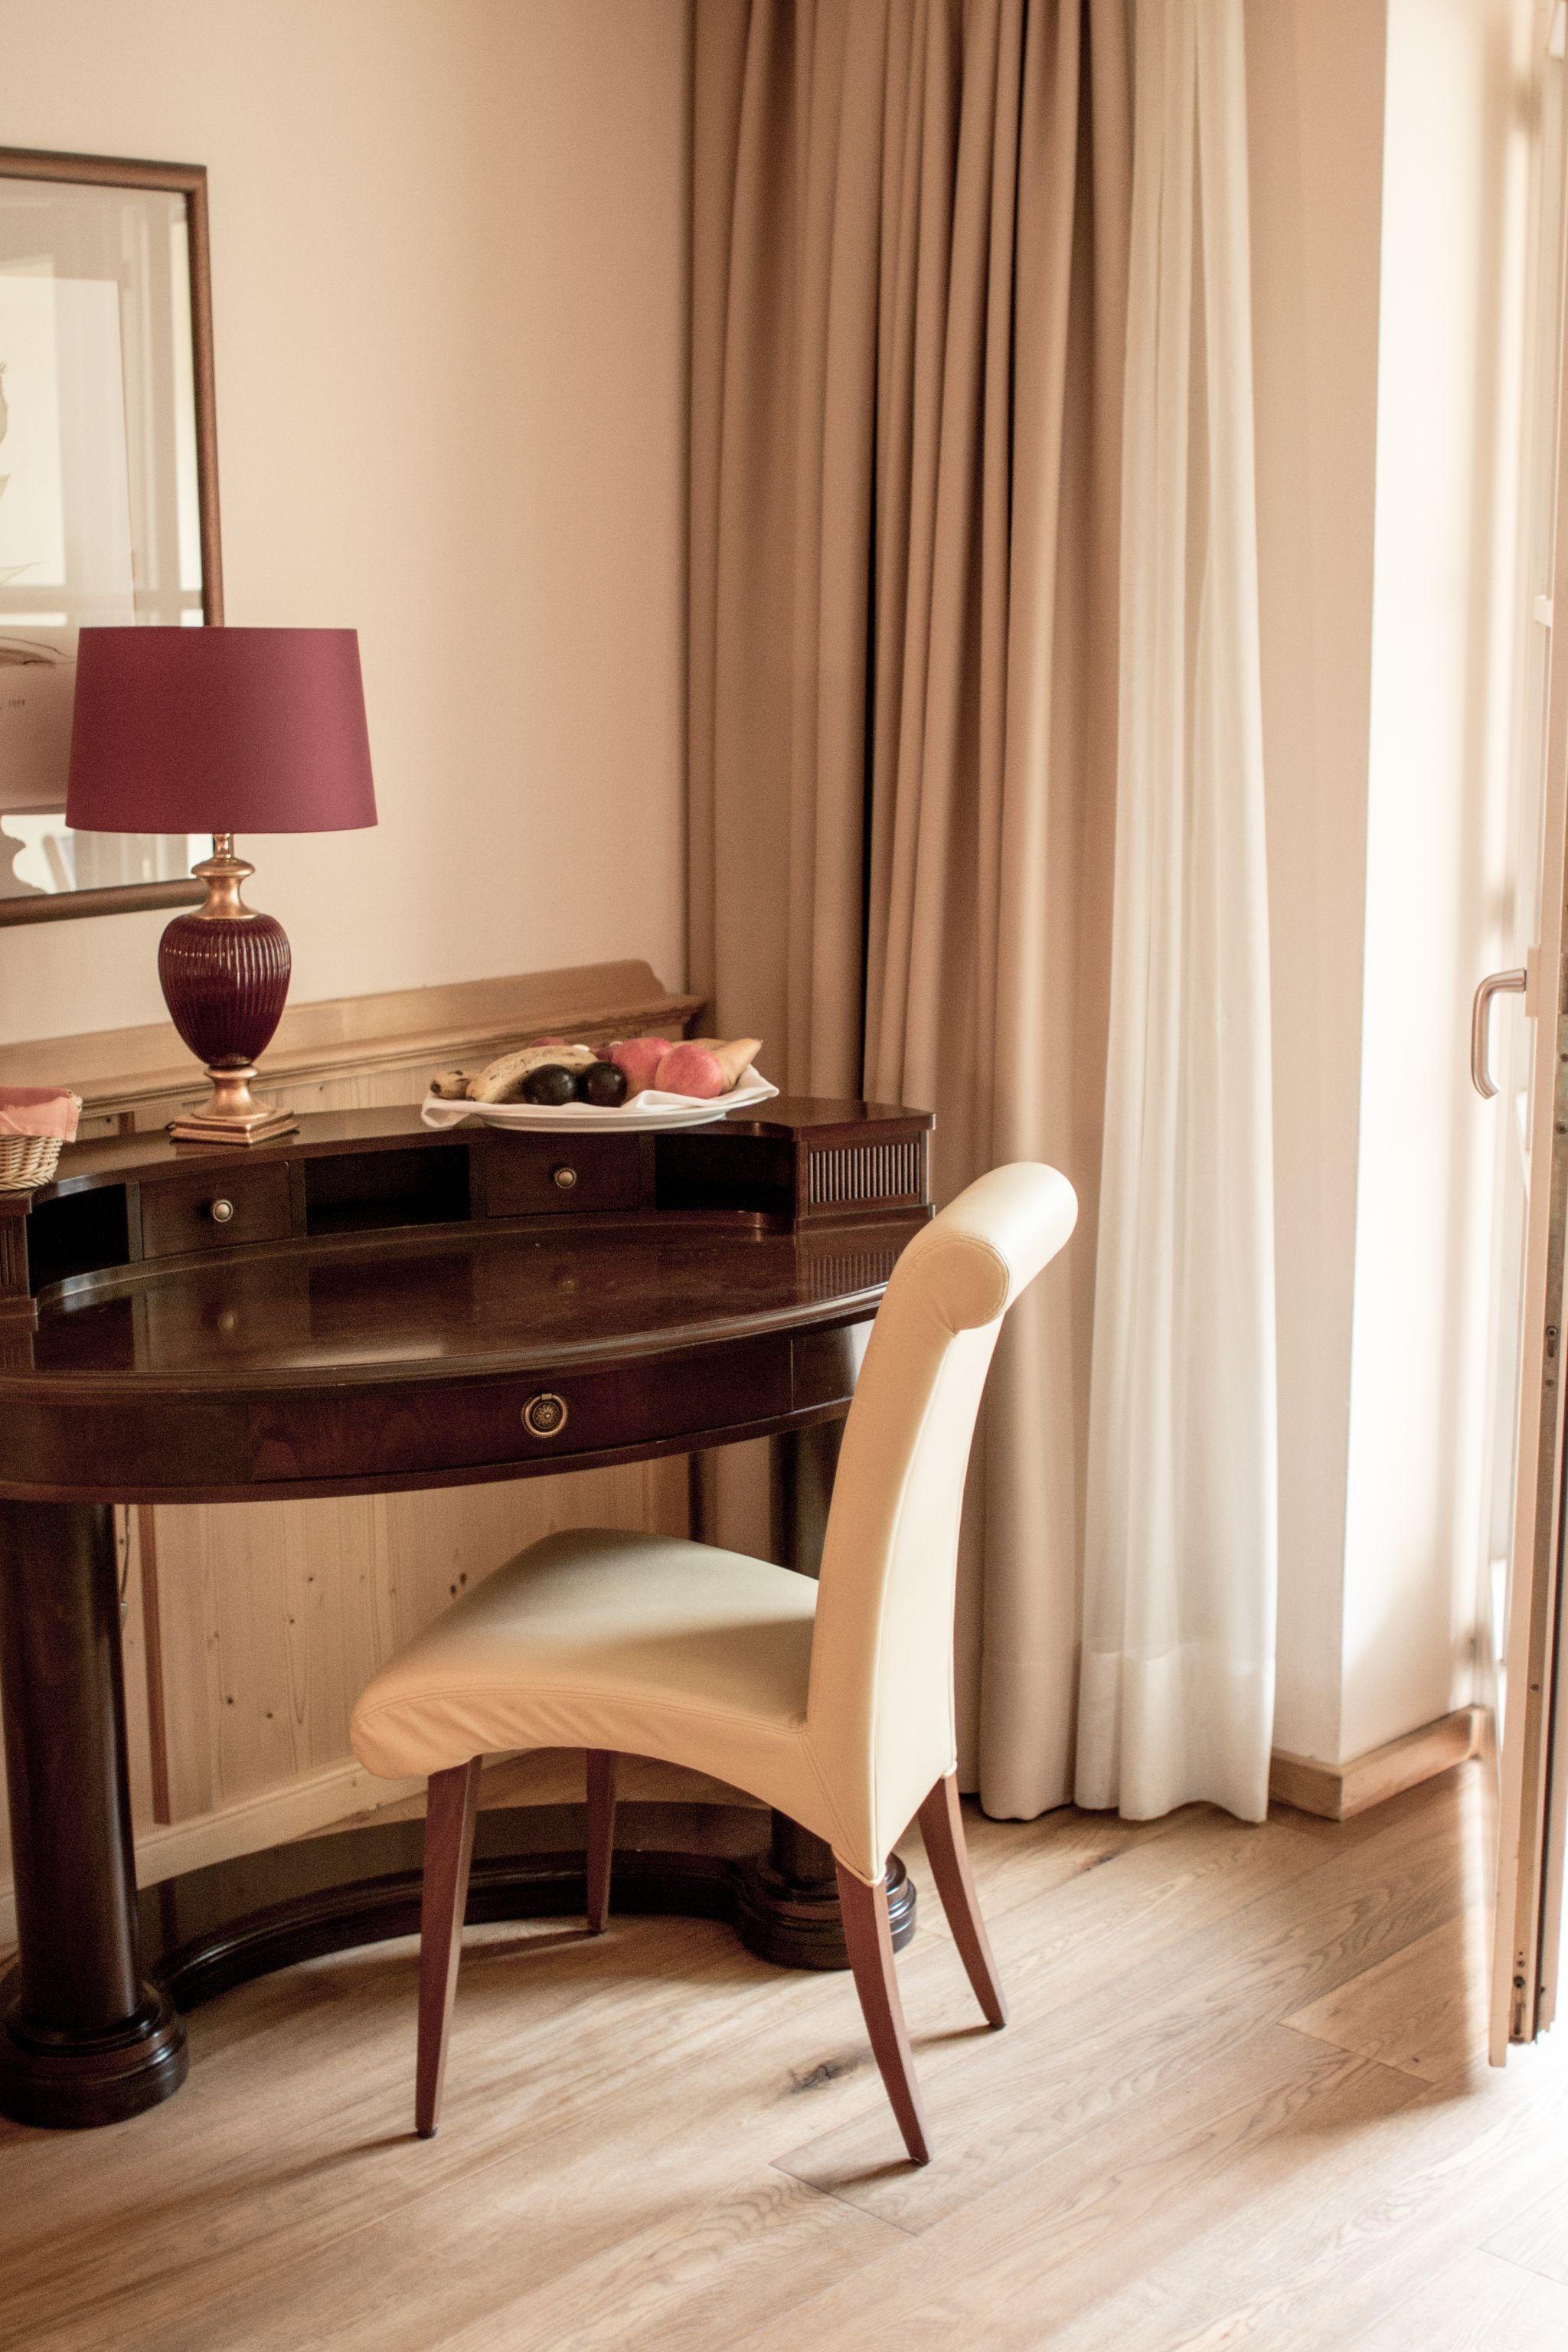 Adler Dolomites Hotel Ortisei Italy Hotel Hospitality Brand Photography Room Interior